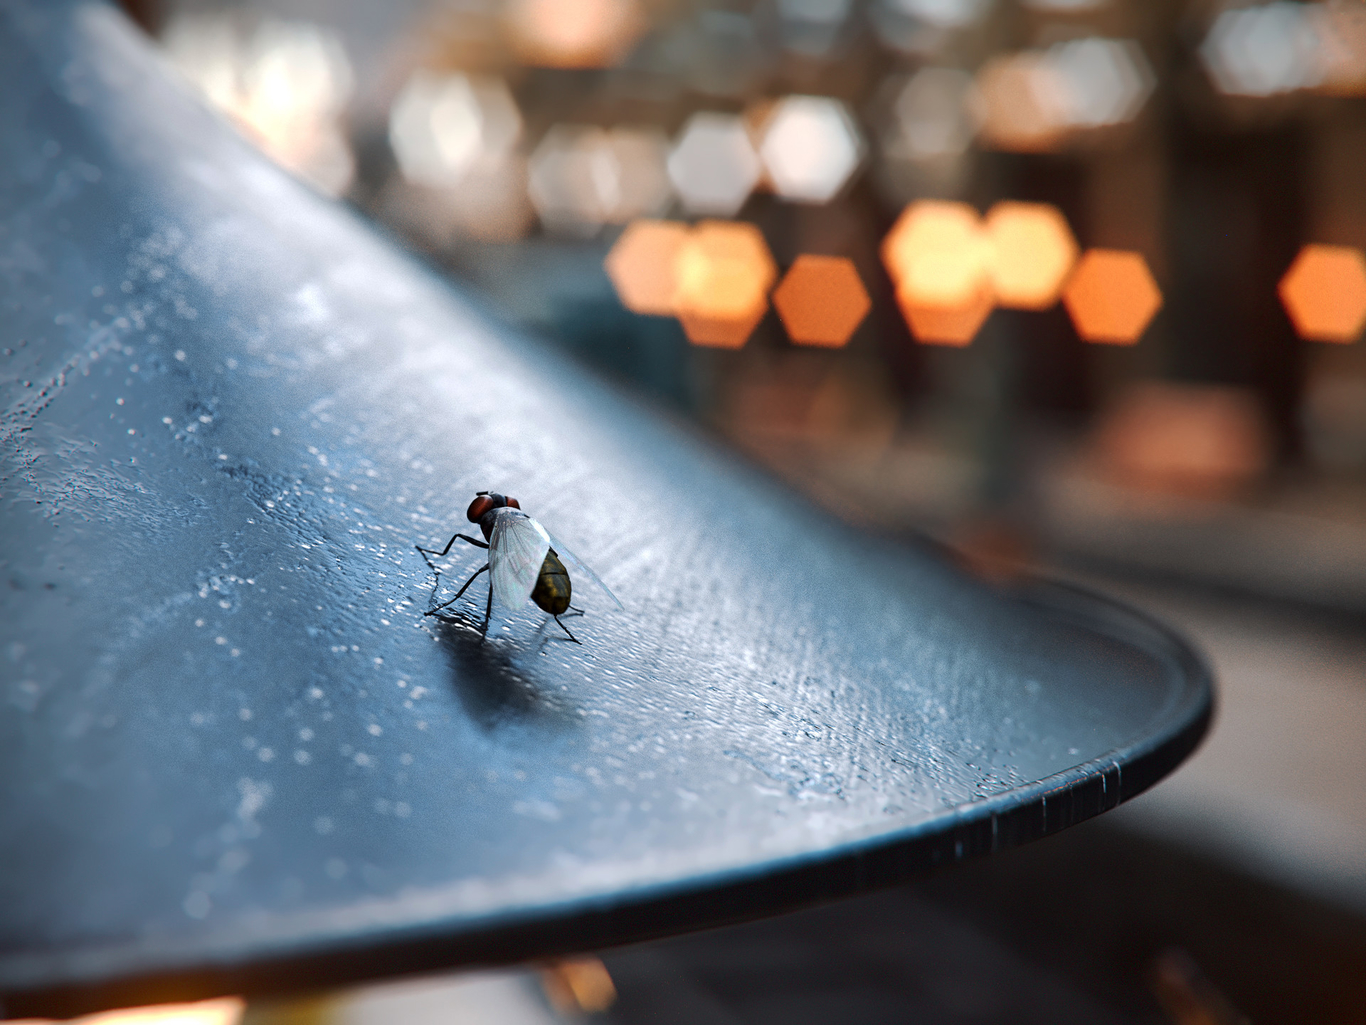 Latter fly closeup 1 4085a614 dyta